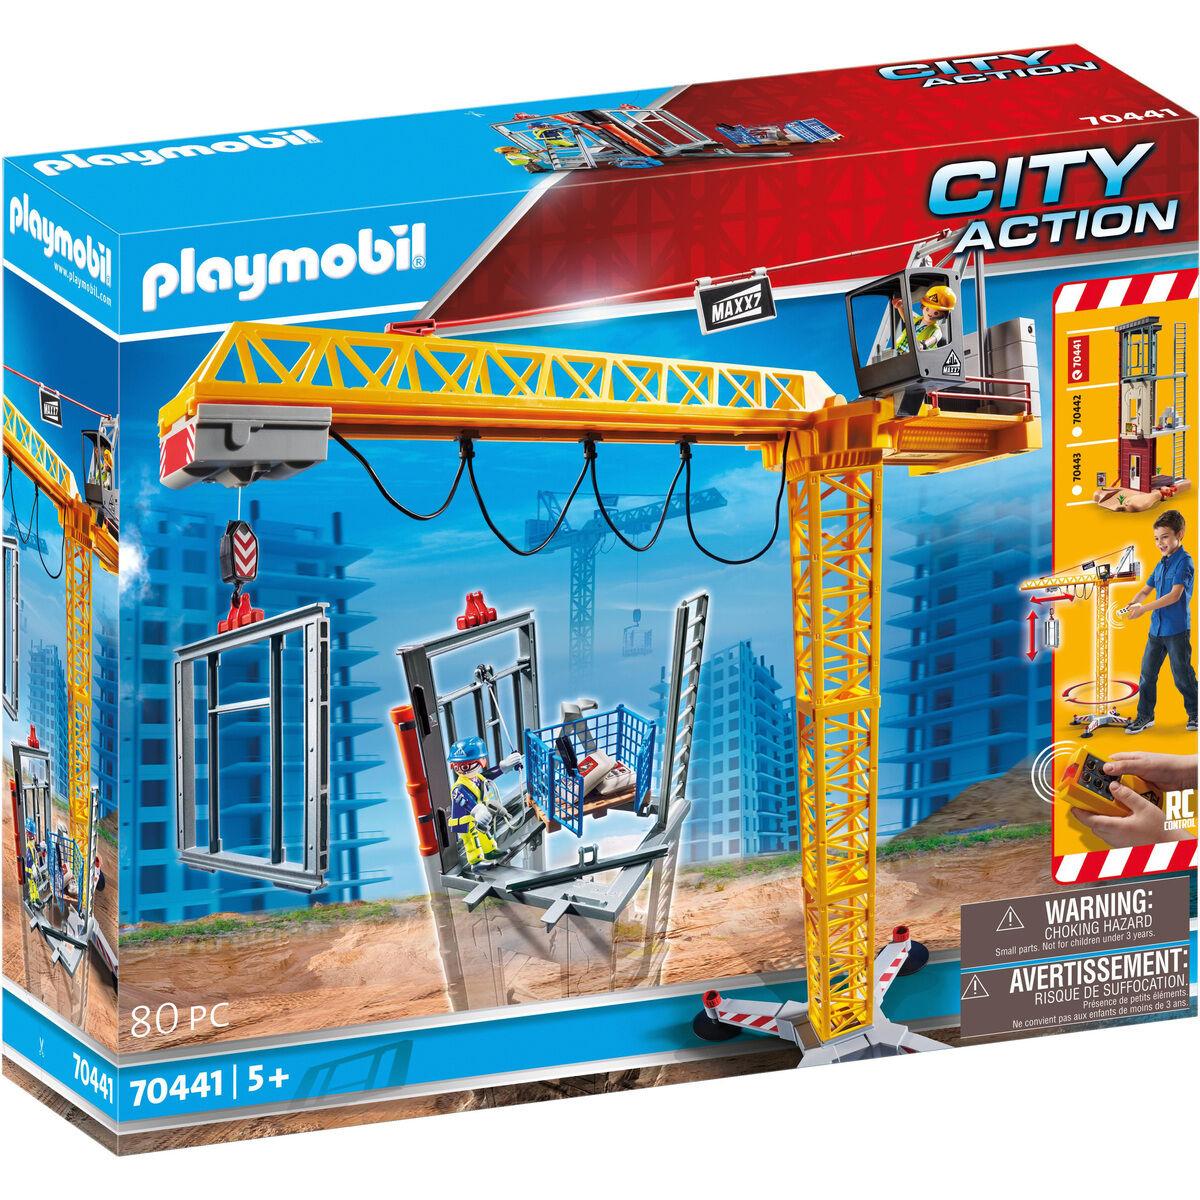 Playmobil RC-Baukran mit Bauteil 70441 [galeria.de]